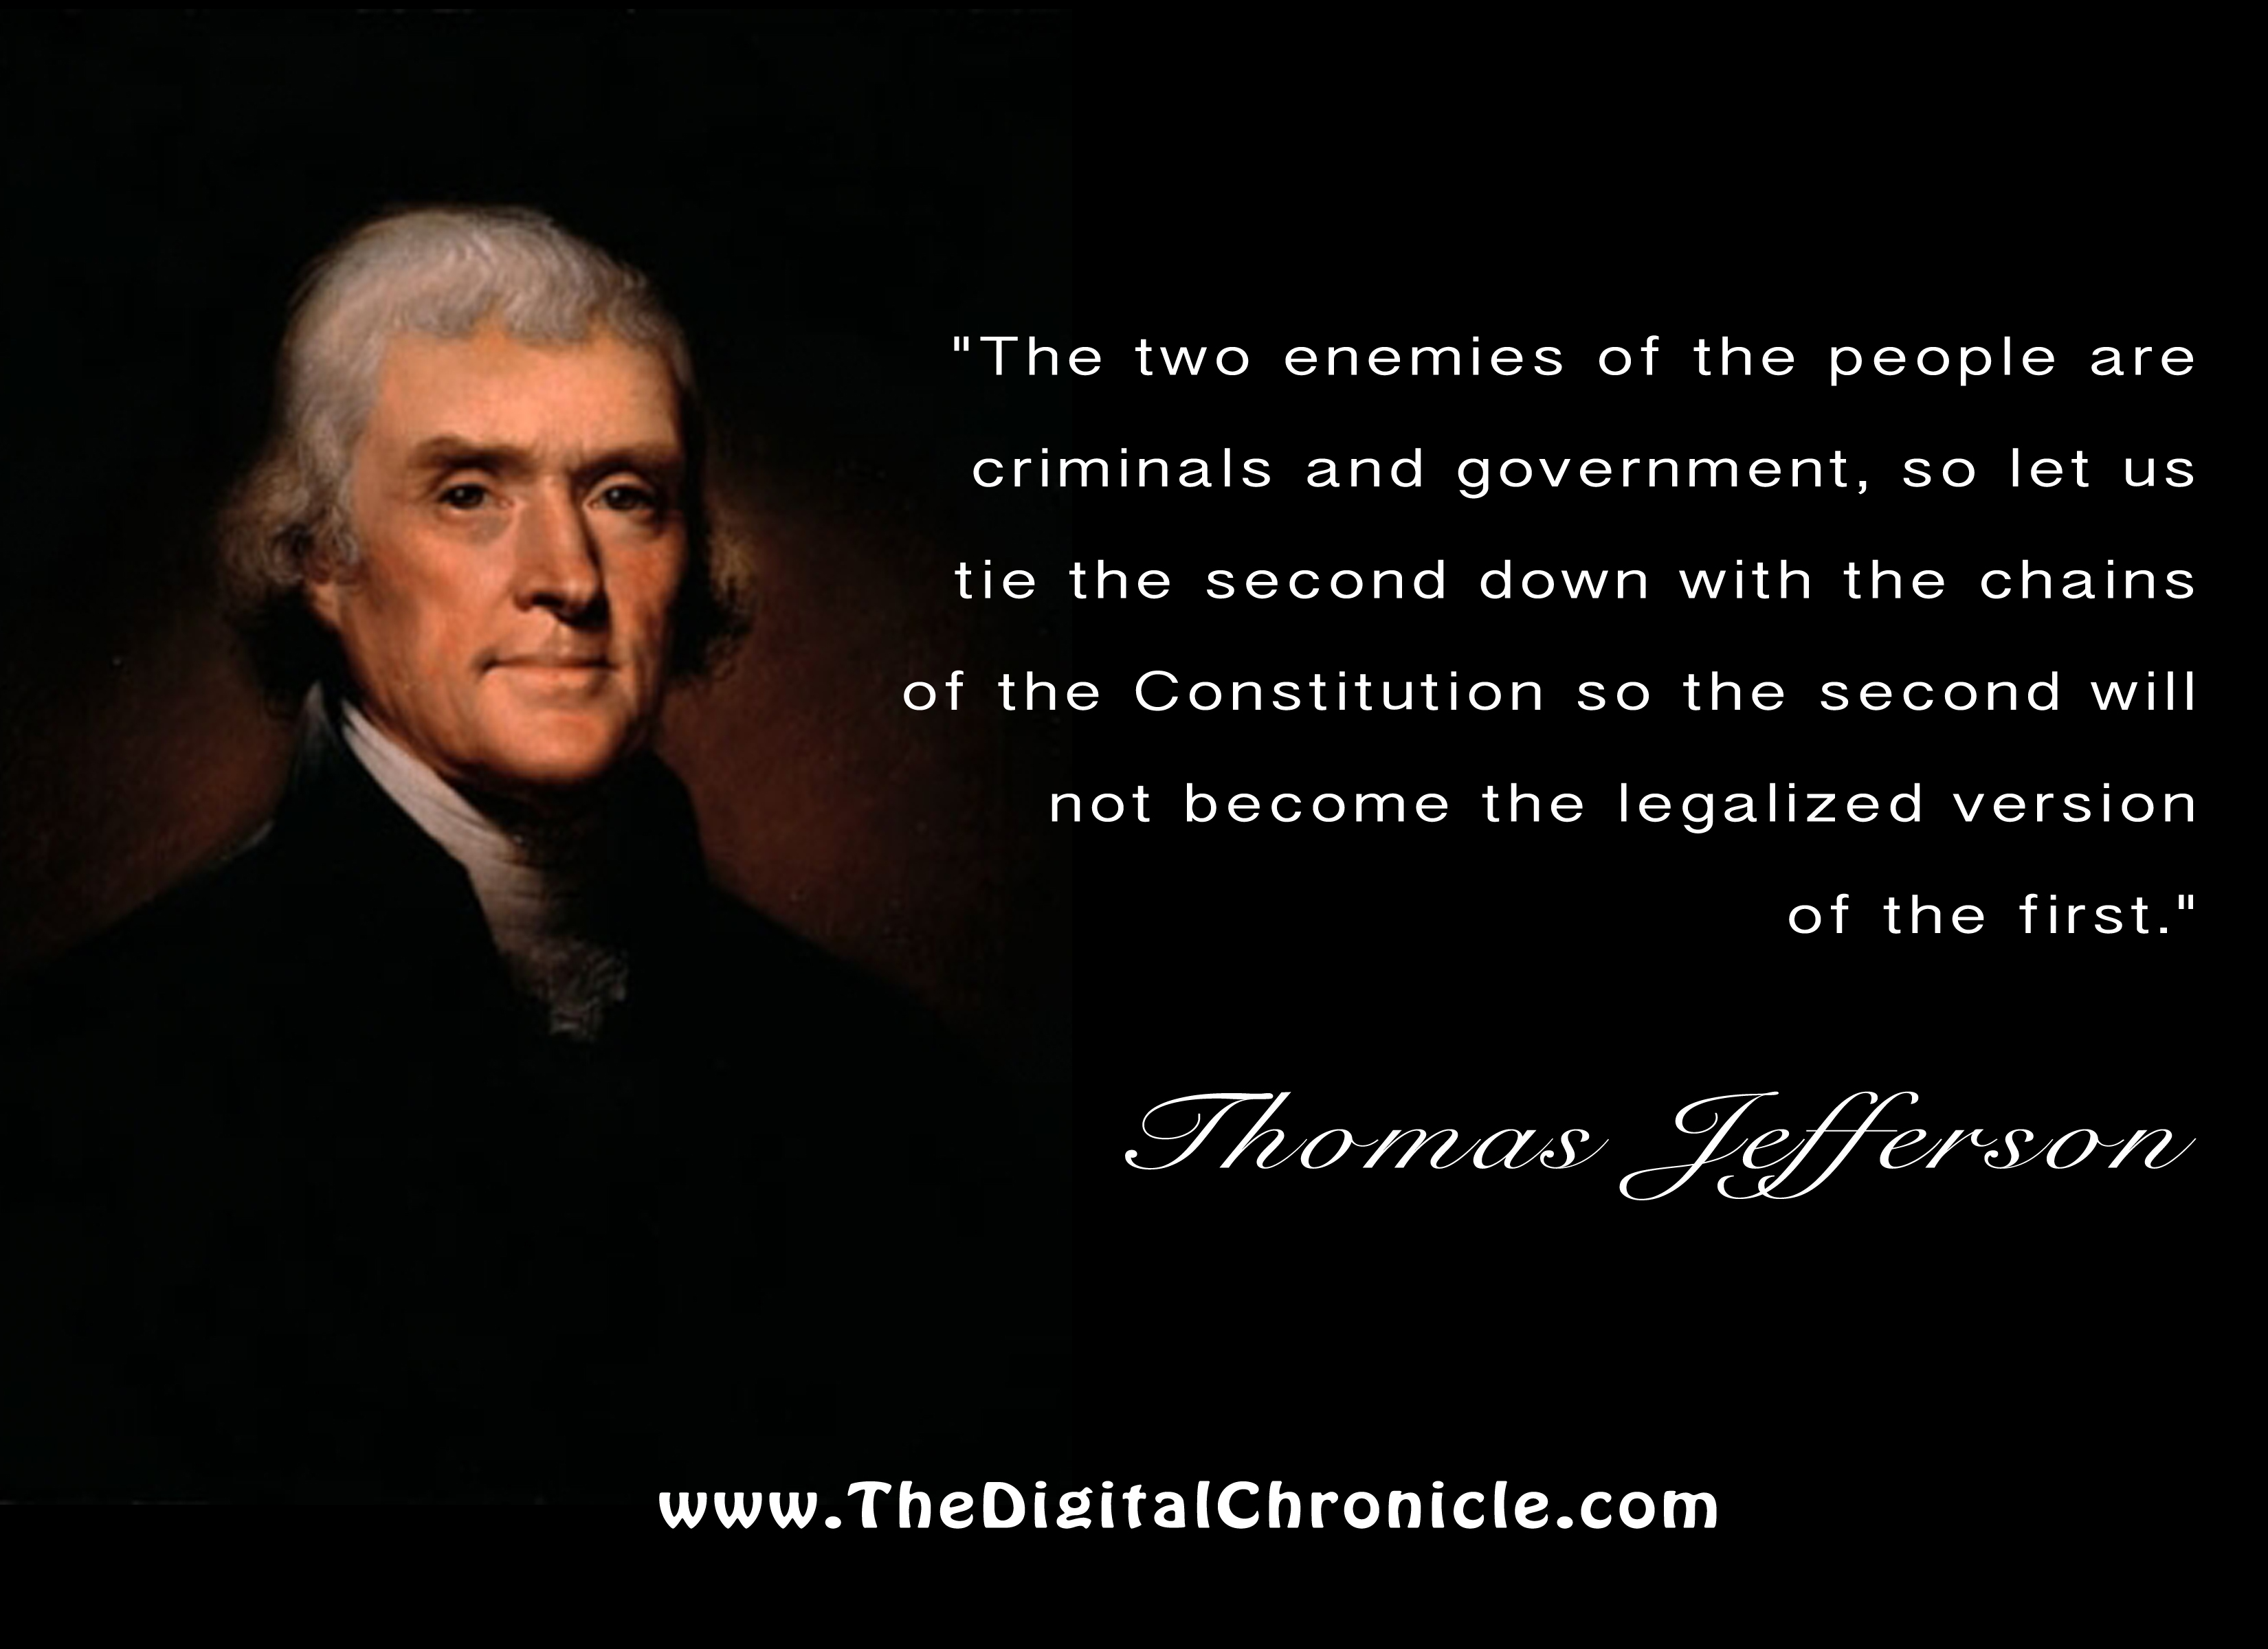 Quotes From Thomas Jefferson Quotesgram